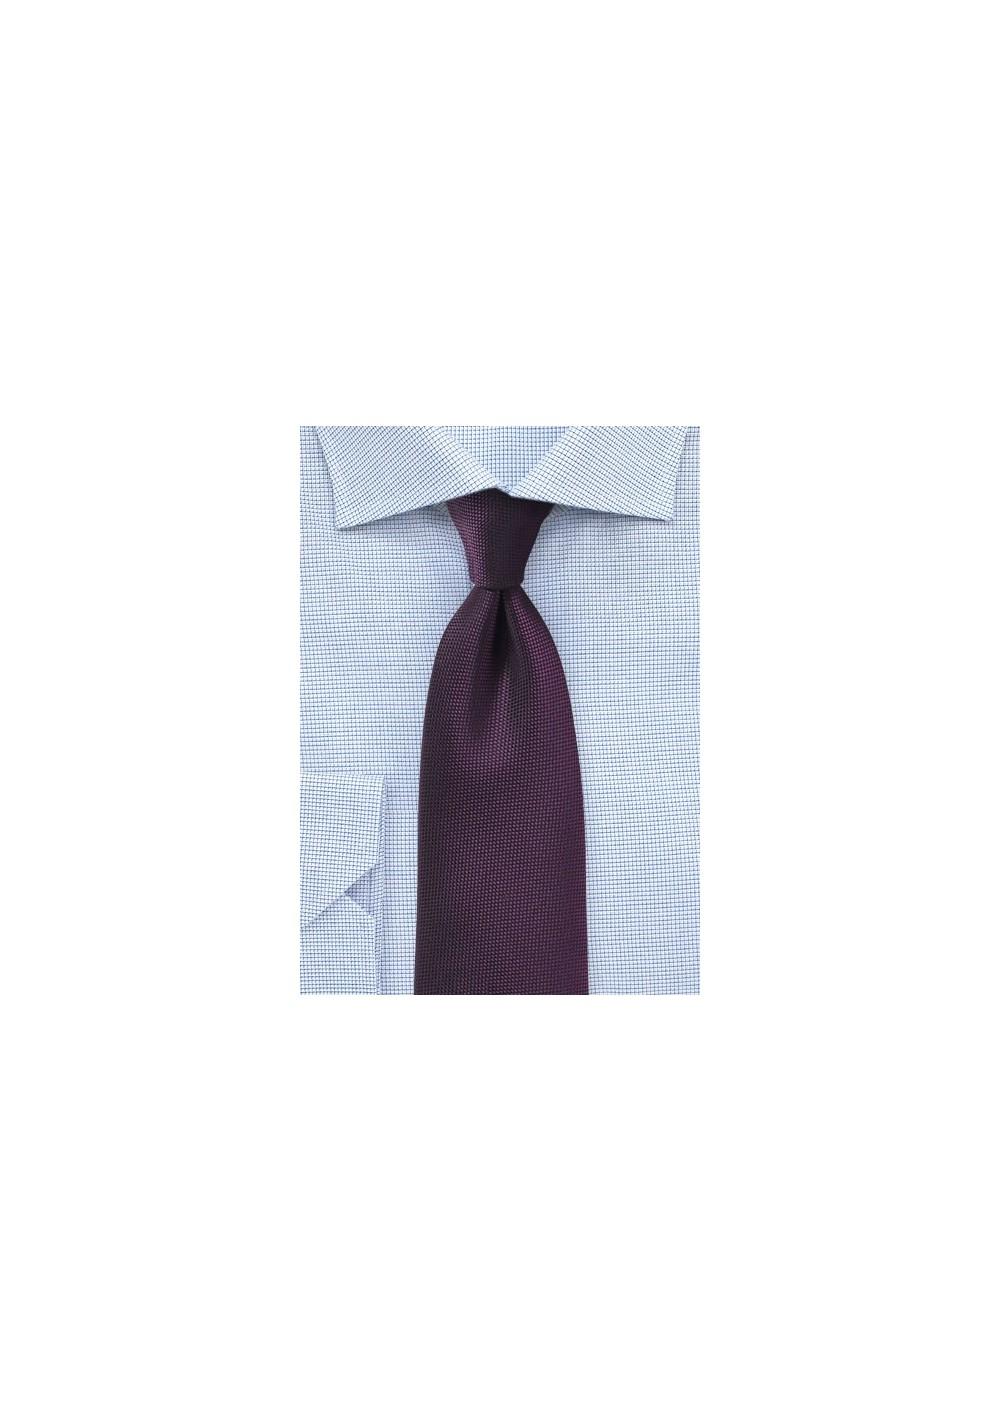 Matte Tie in Grape